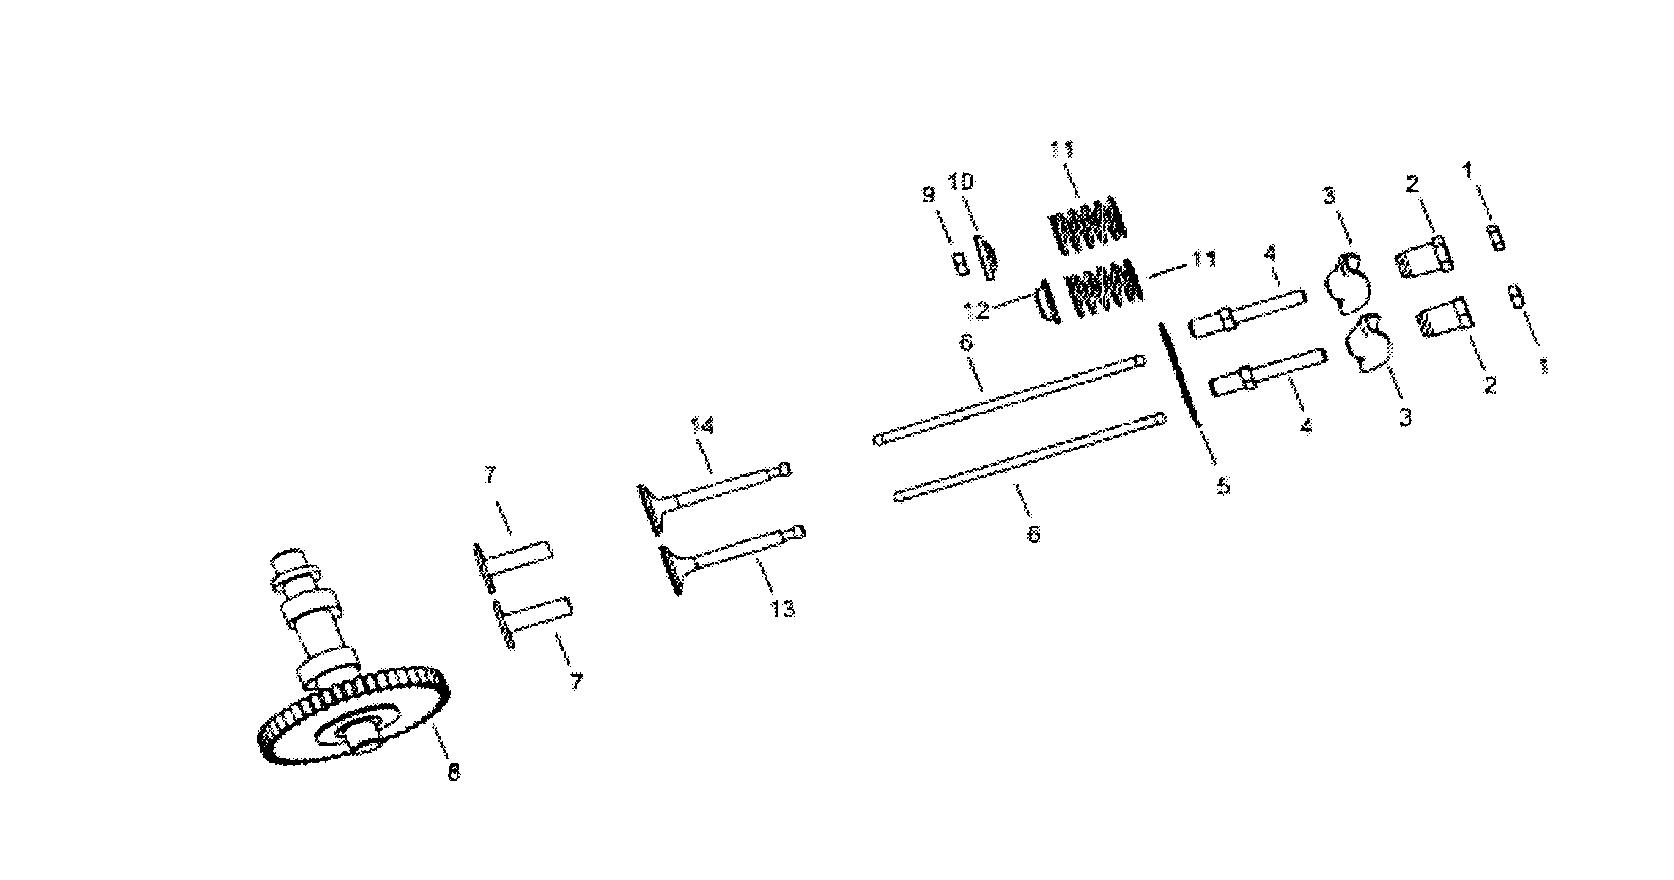 50034051 00006?resize\\\\\\\\\\\\\\\=665%2C349\\\\\\\\\\\\\\\&ssl\\\\\\\\\\\\\\\=1 onan engine wiring diagram ignition module john deere within 20 hp gravely promaster 300 wiring diagram at readyjetset.co